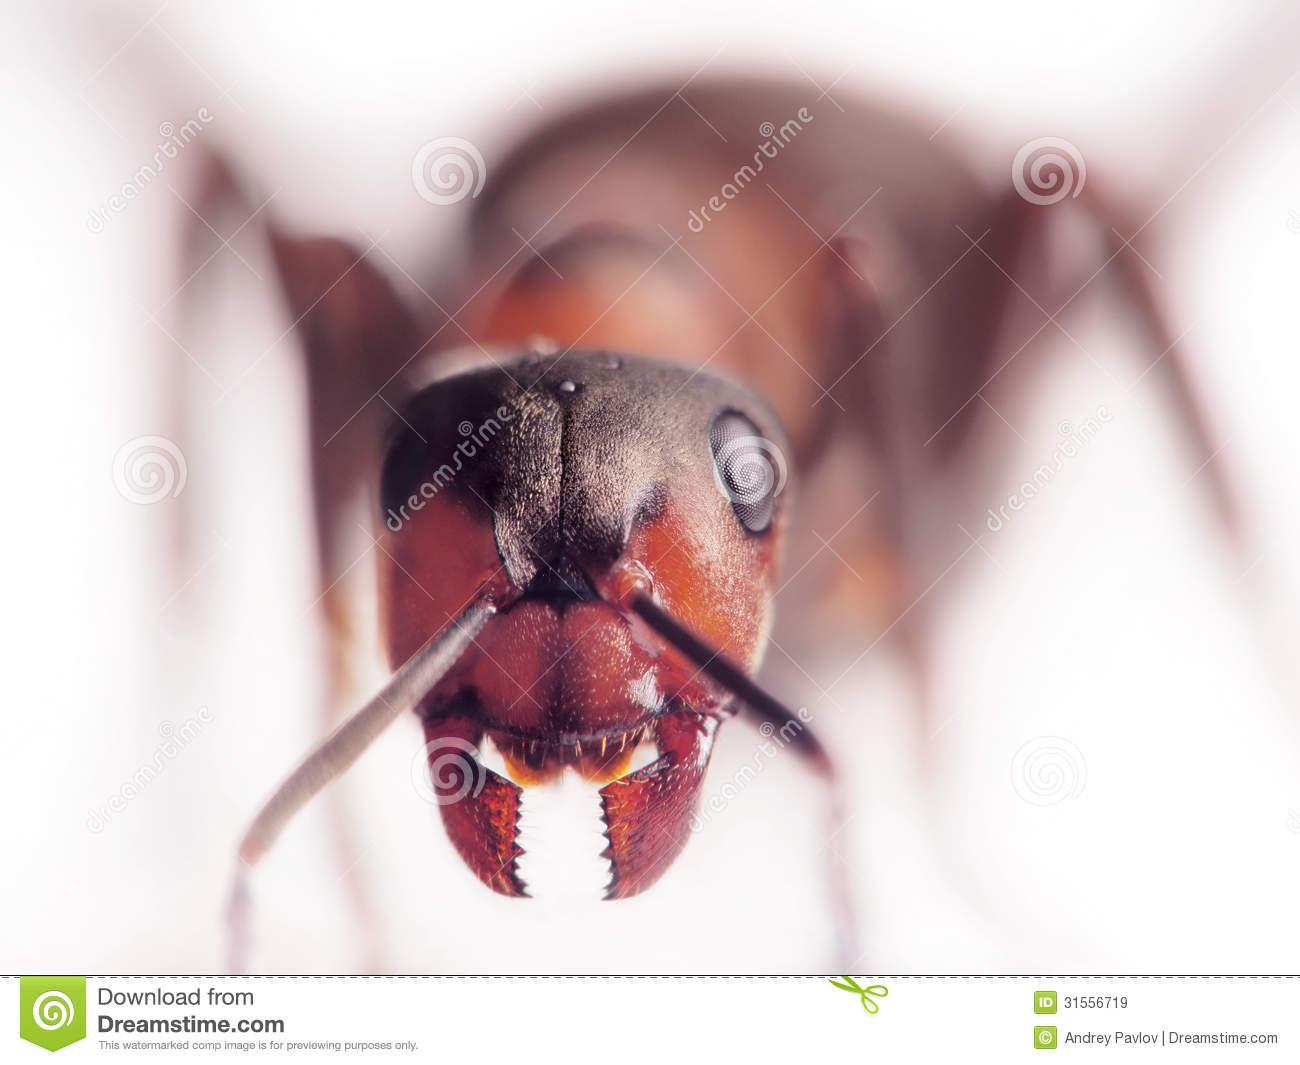 Ant Formica Rufa Face.